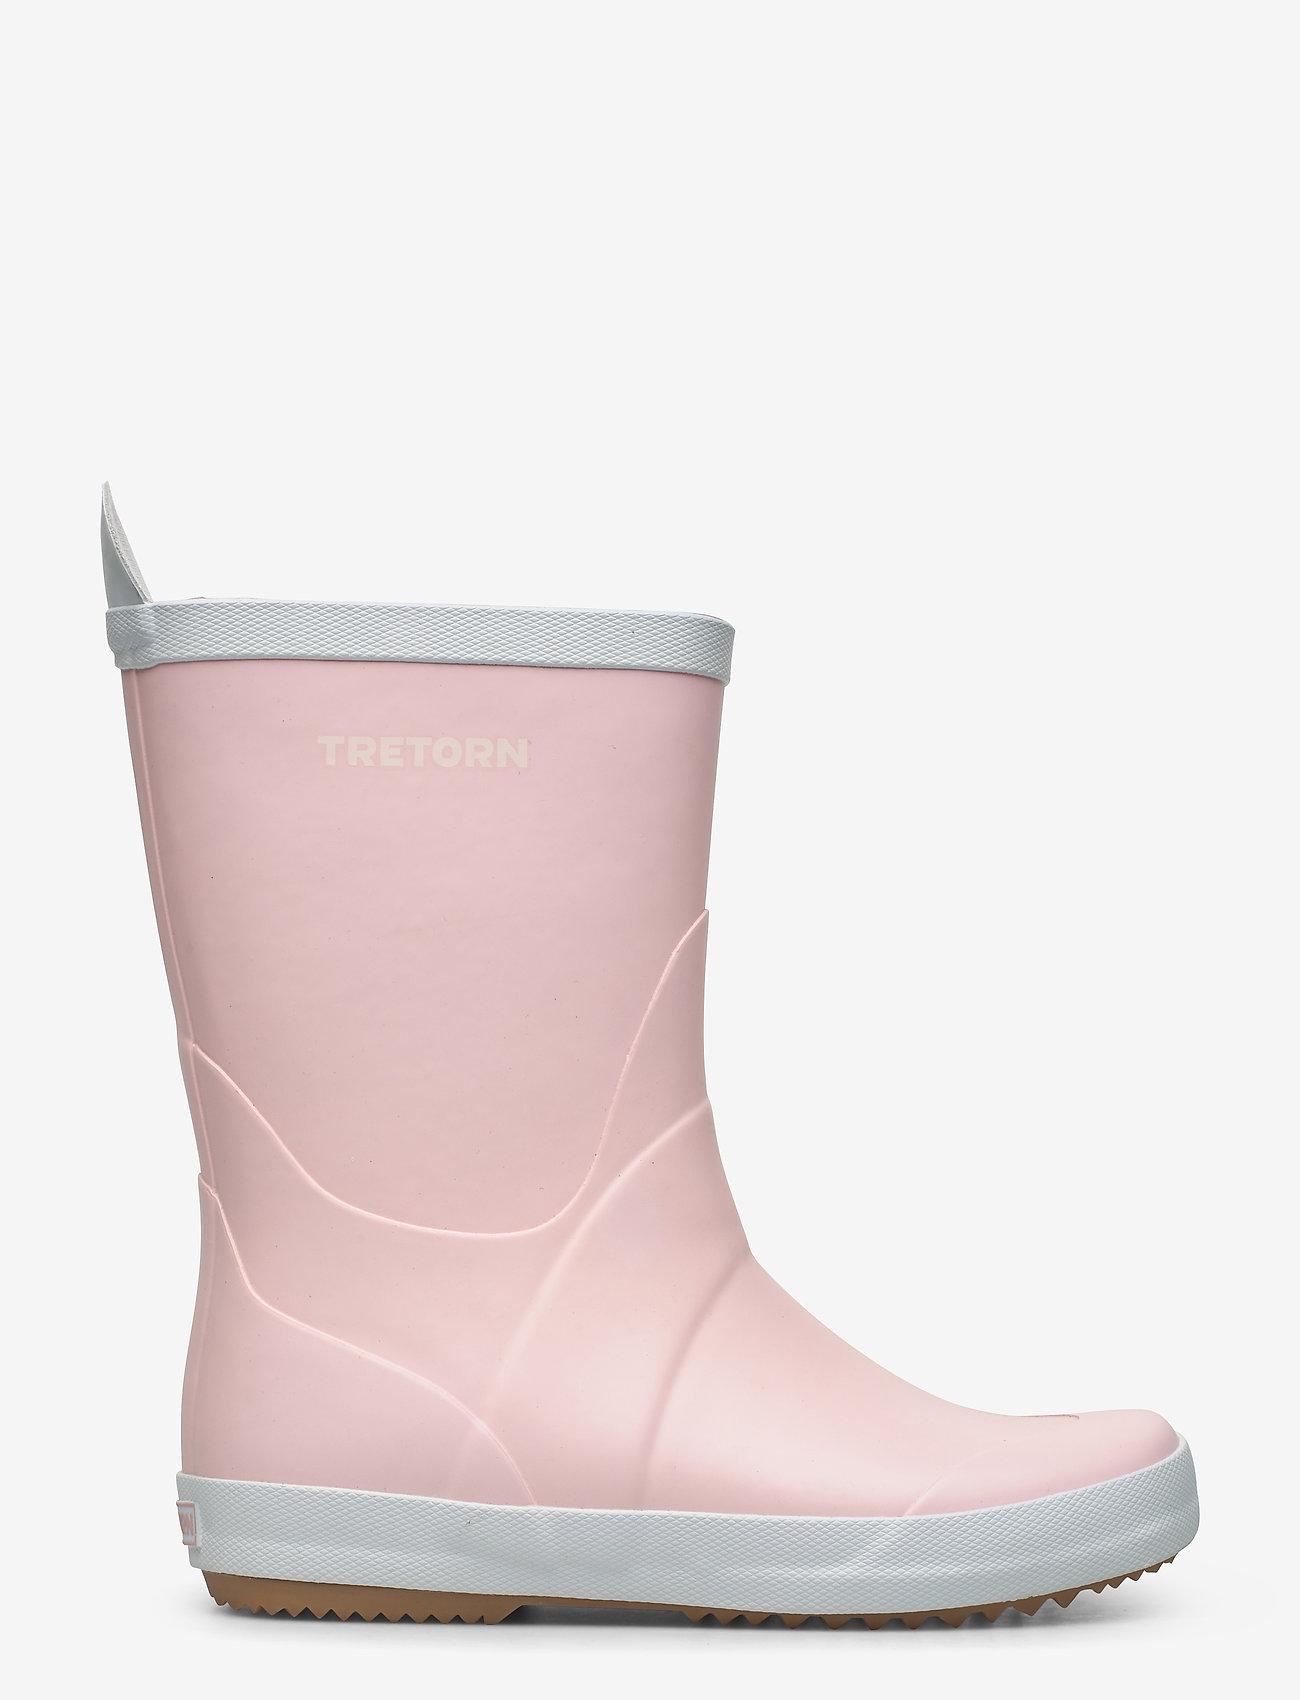 Tretorn - WINGS - rain boots - 097/blossom - 1